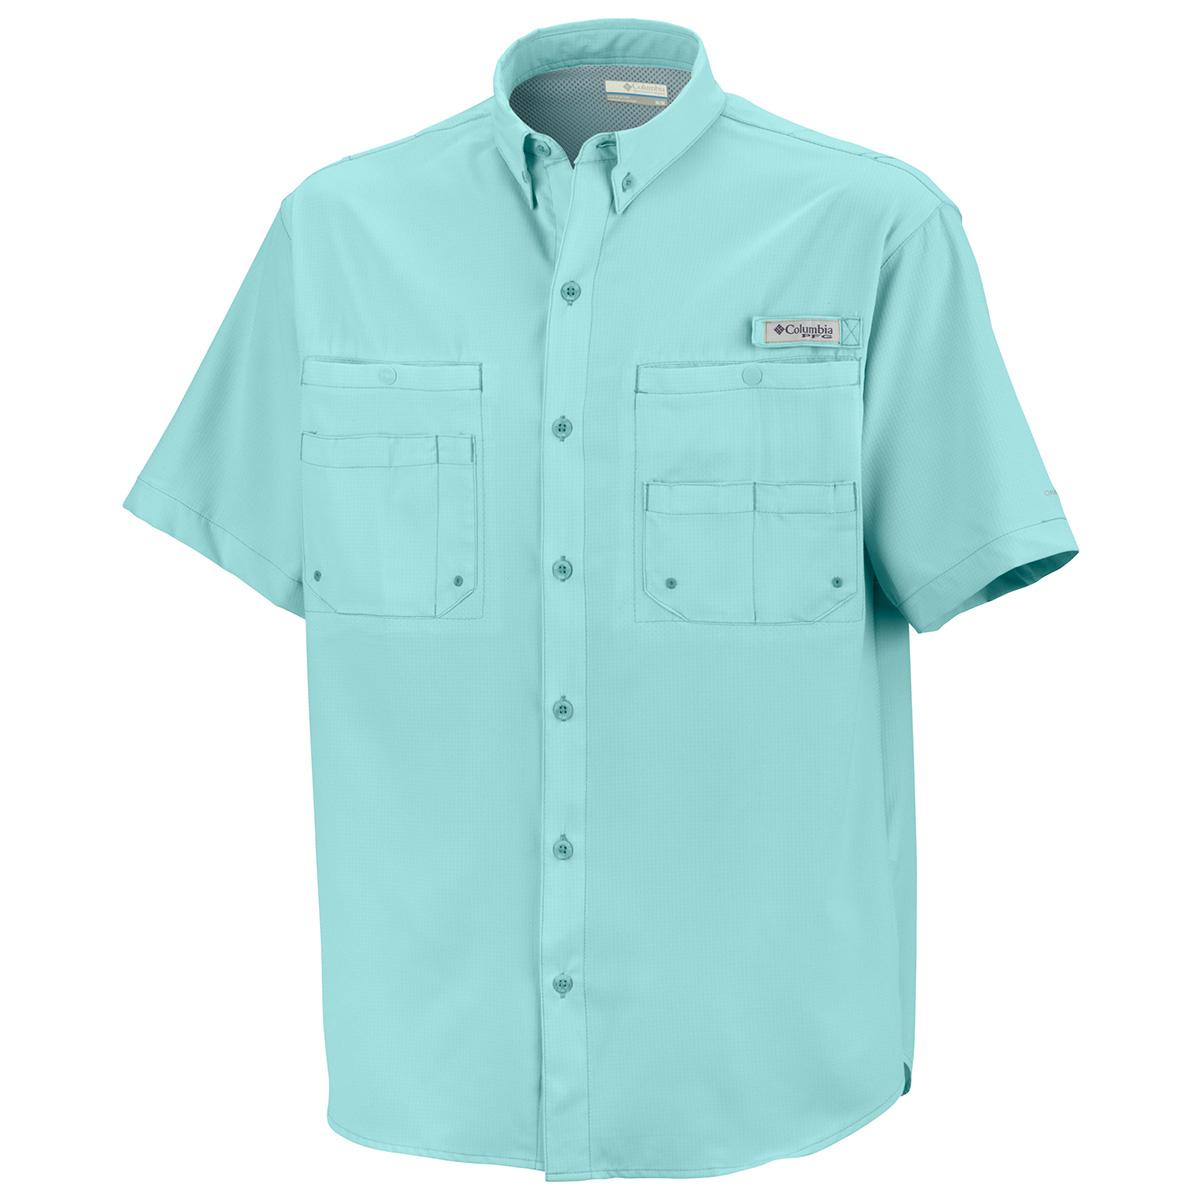 Columbia tamiami ii ss shirt fishing shirts ebay for Pfg fishing shirts